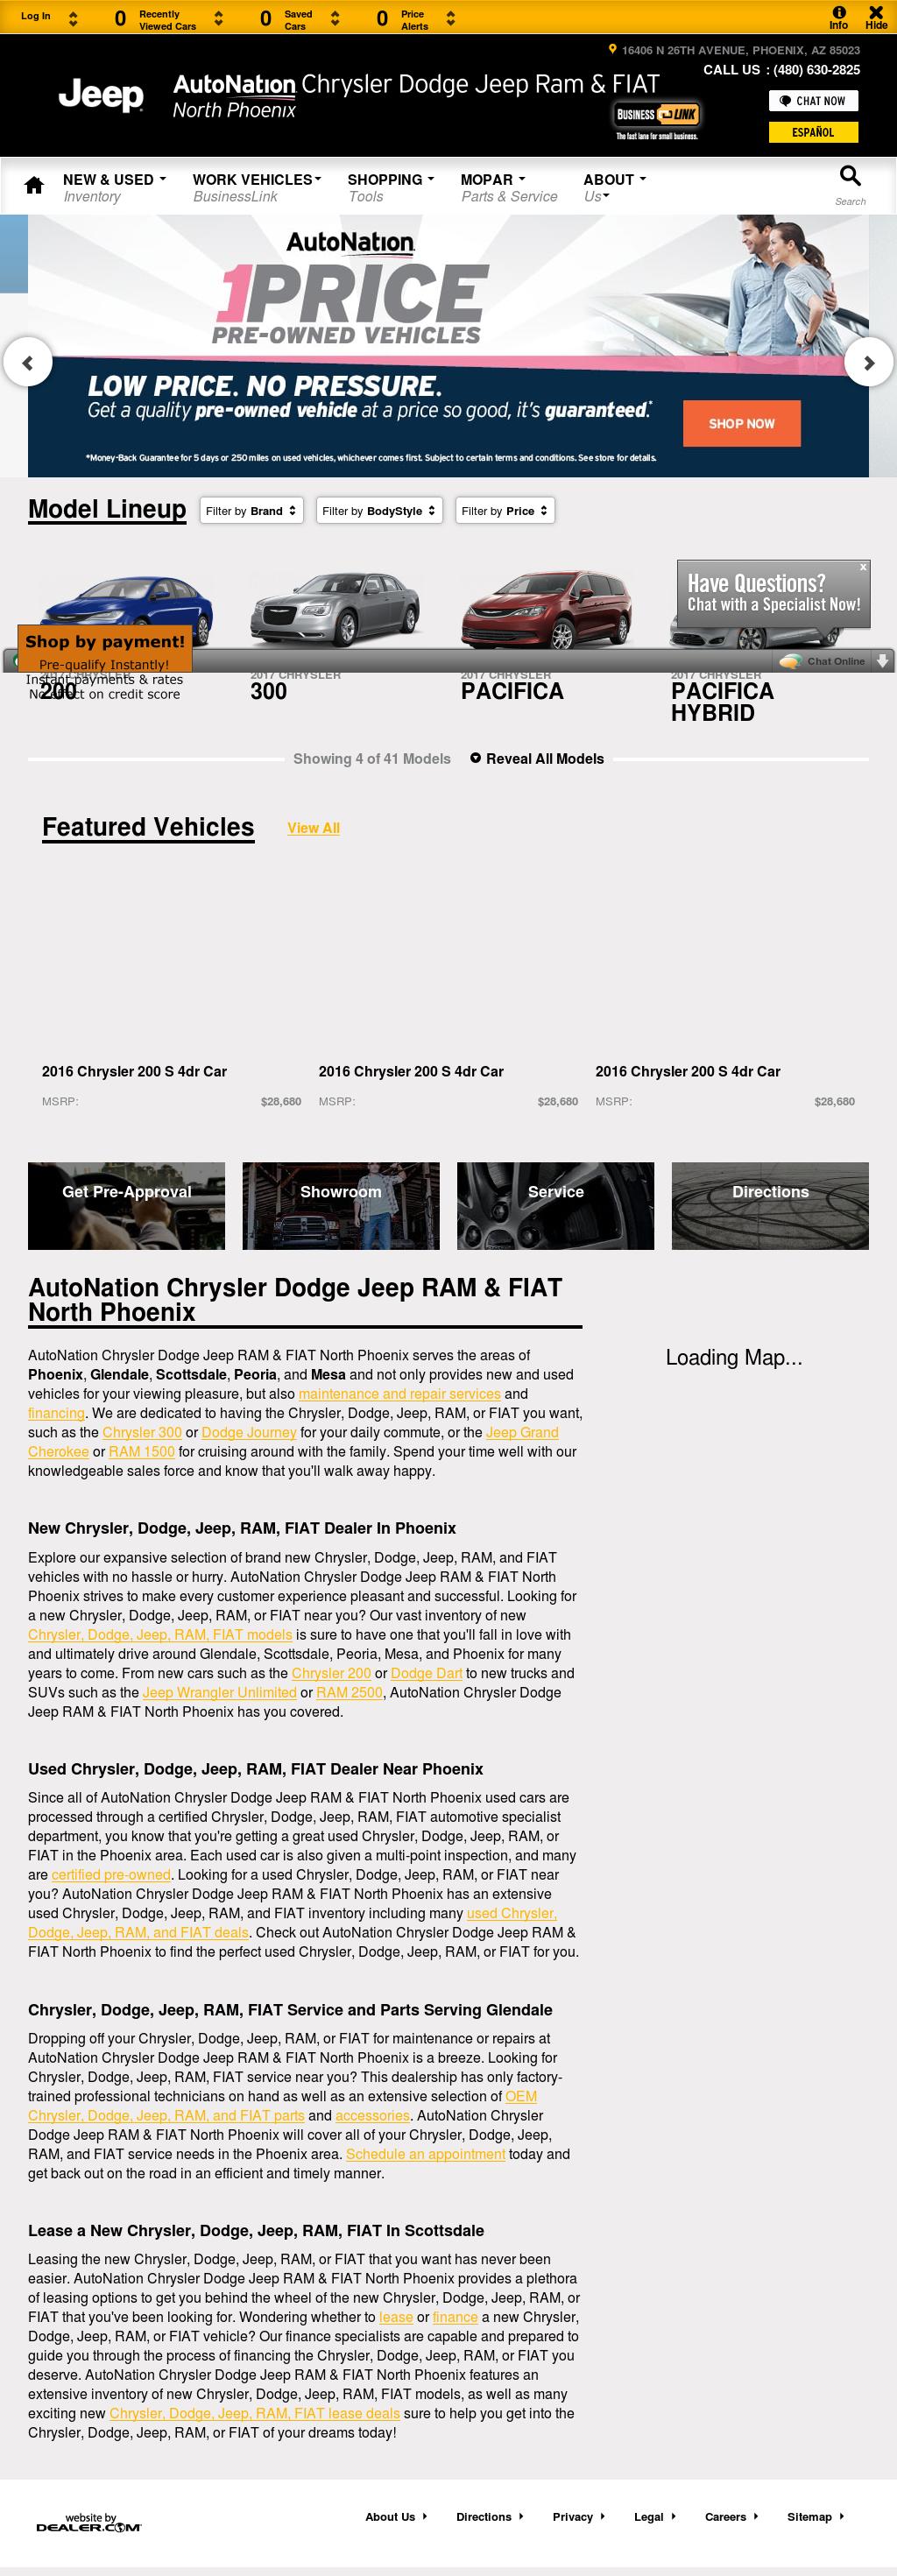 Autonation North Phoenix >> Autonation Chrysler Dodge Jeep Ram North Phoenix Competitors